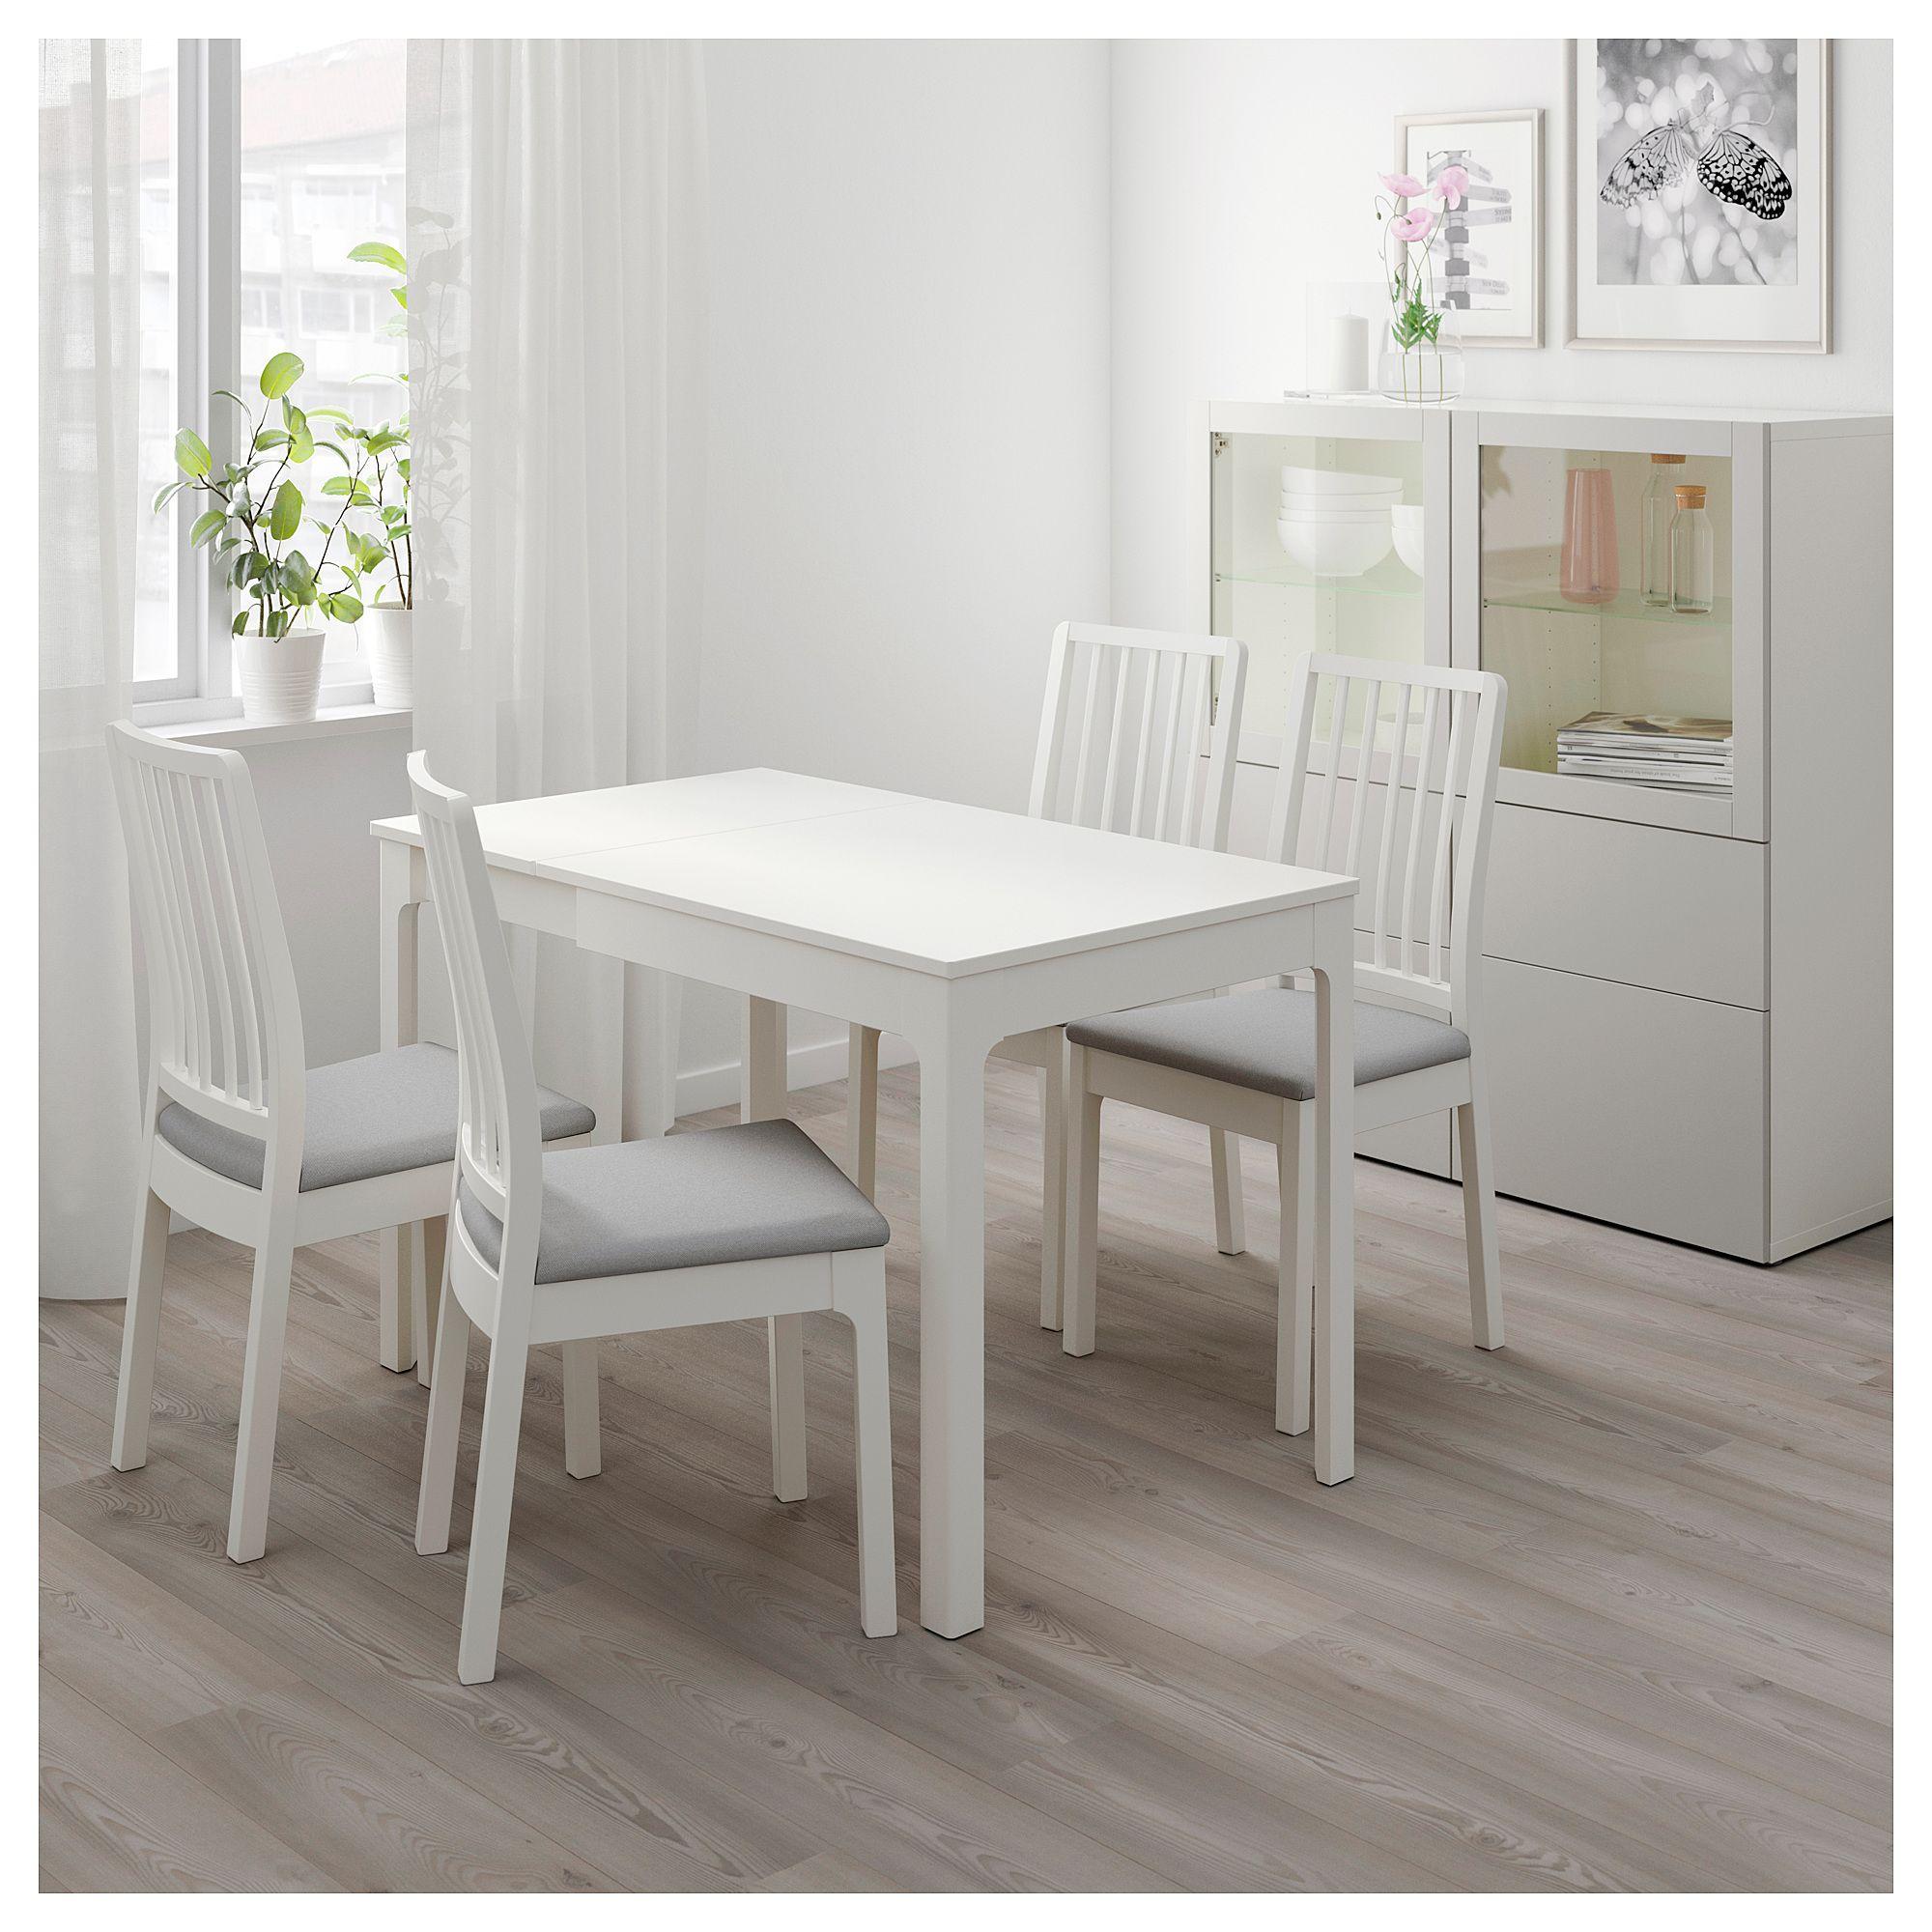 EKEDALEN Extendable table white 31 1/2/47 1/4x27 1/2